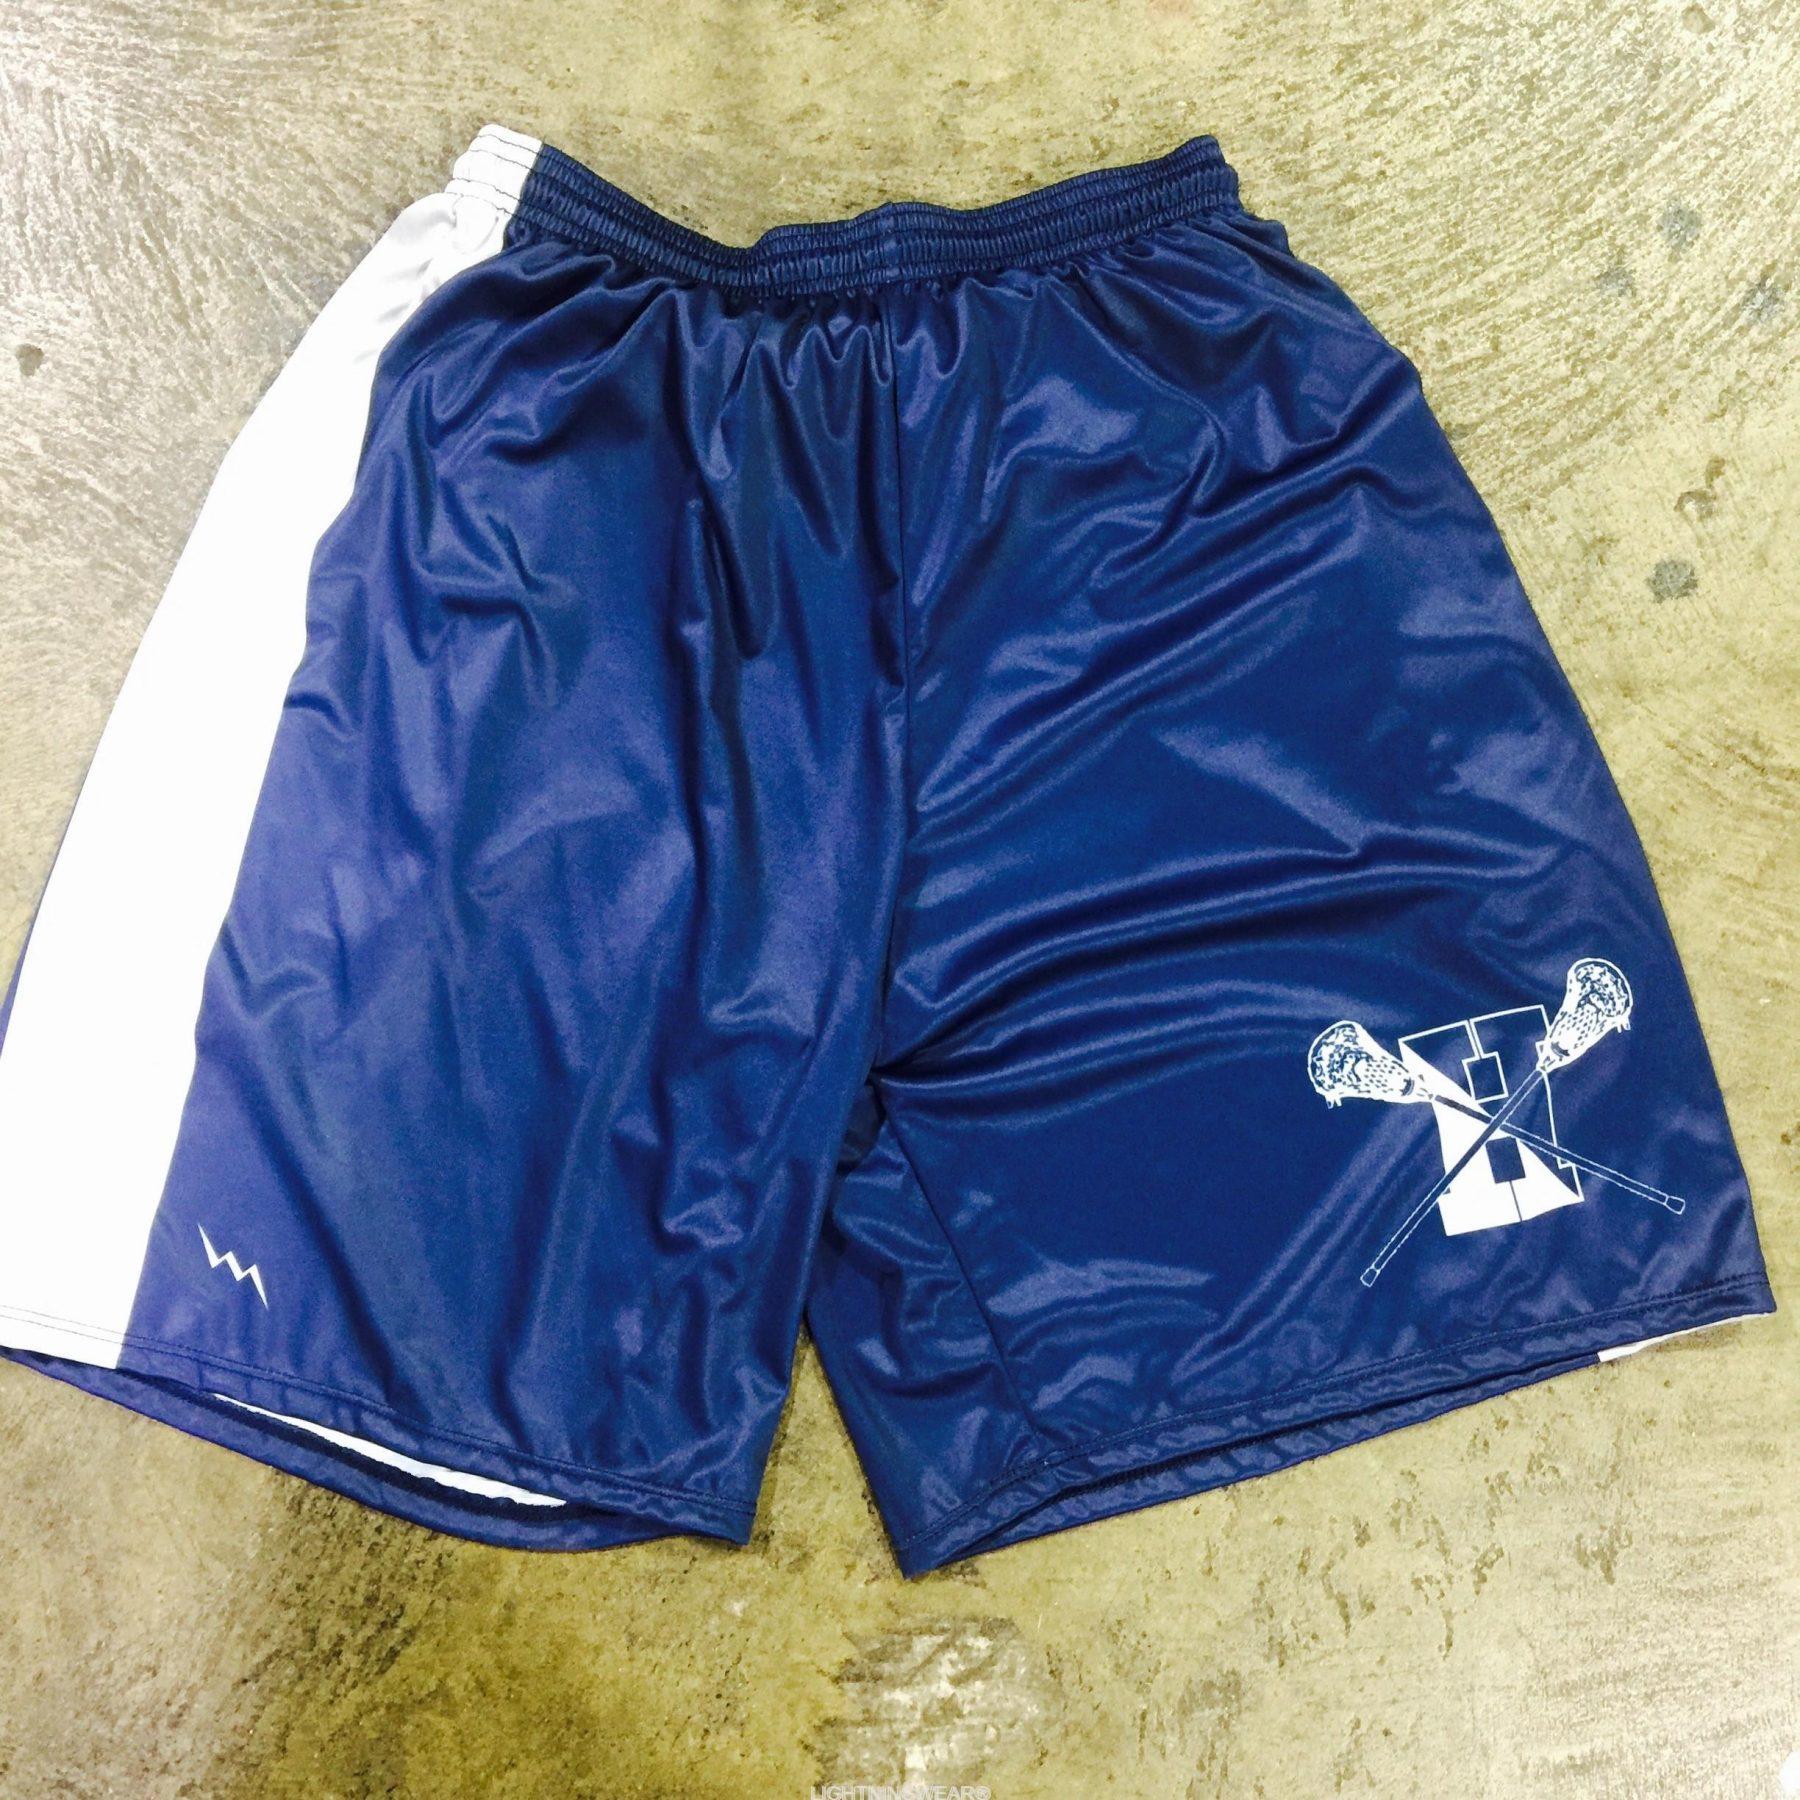 navy blue lacrosse shorts